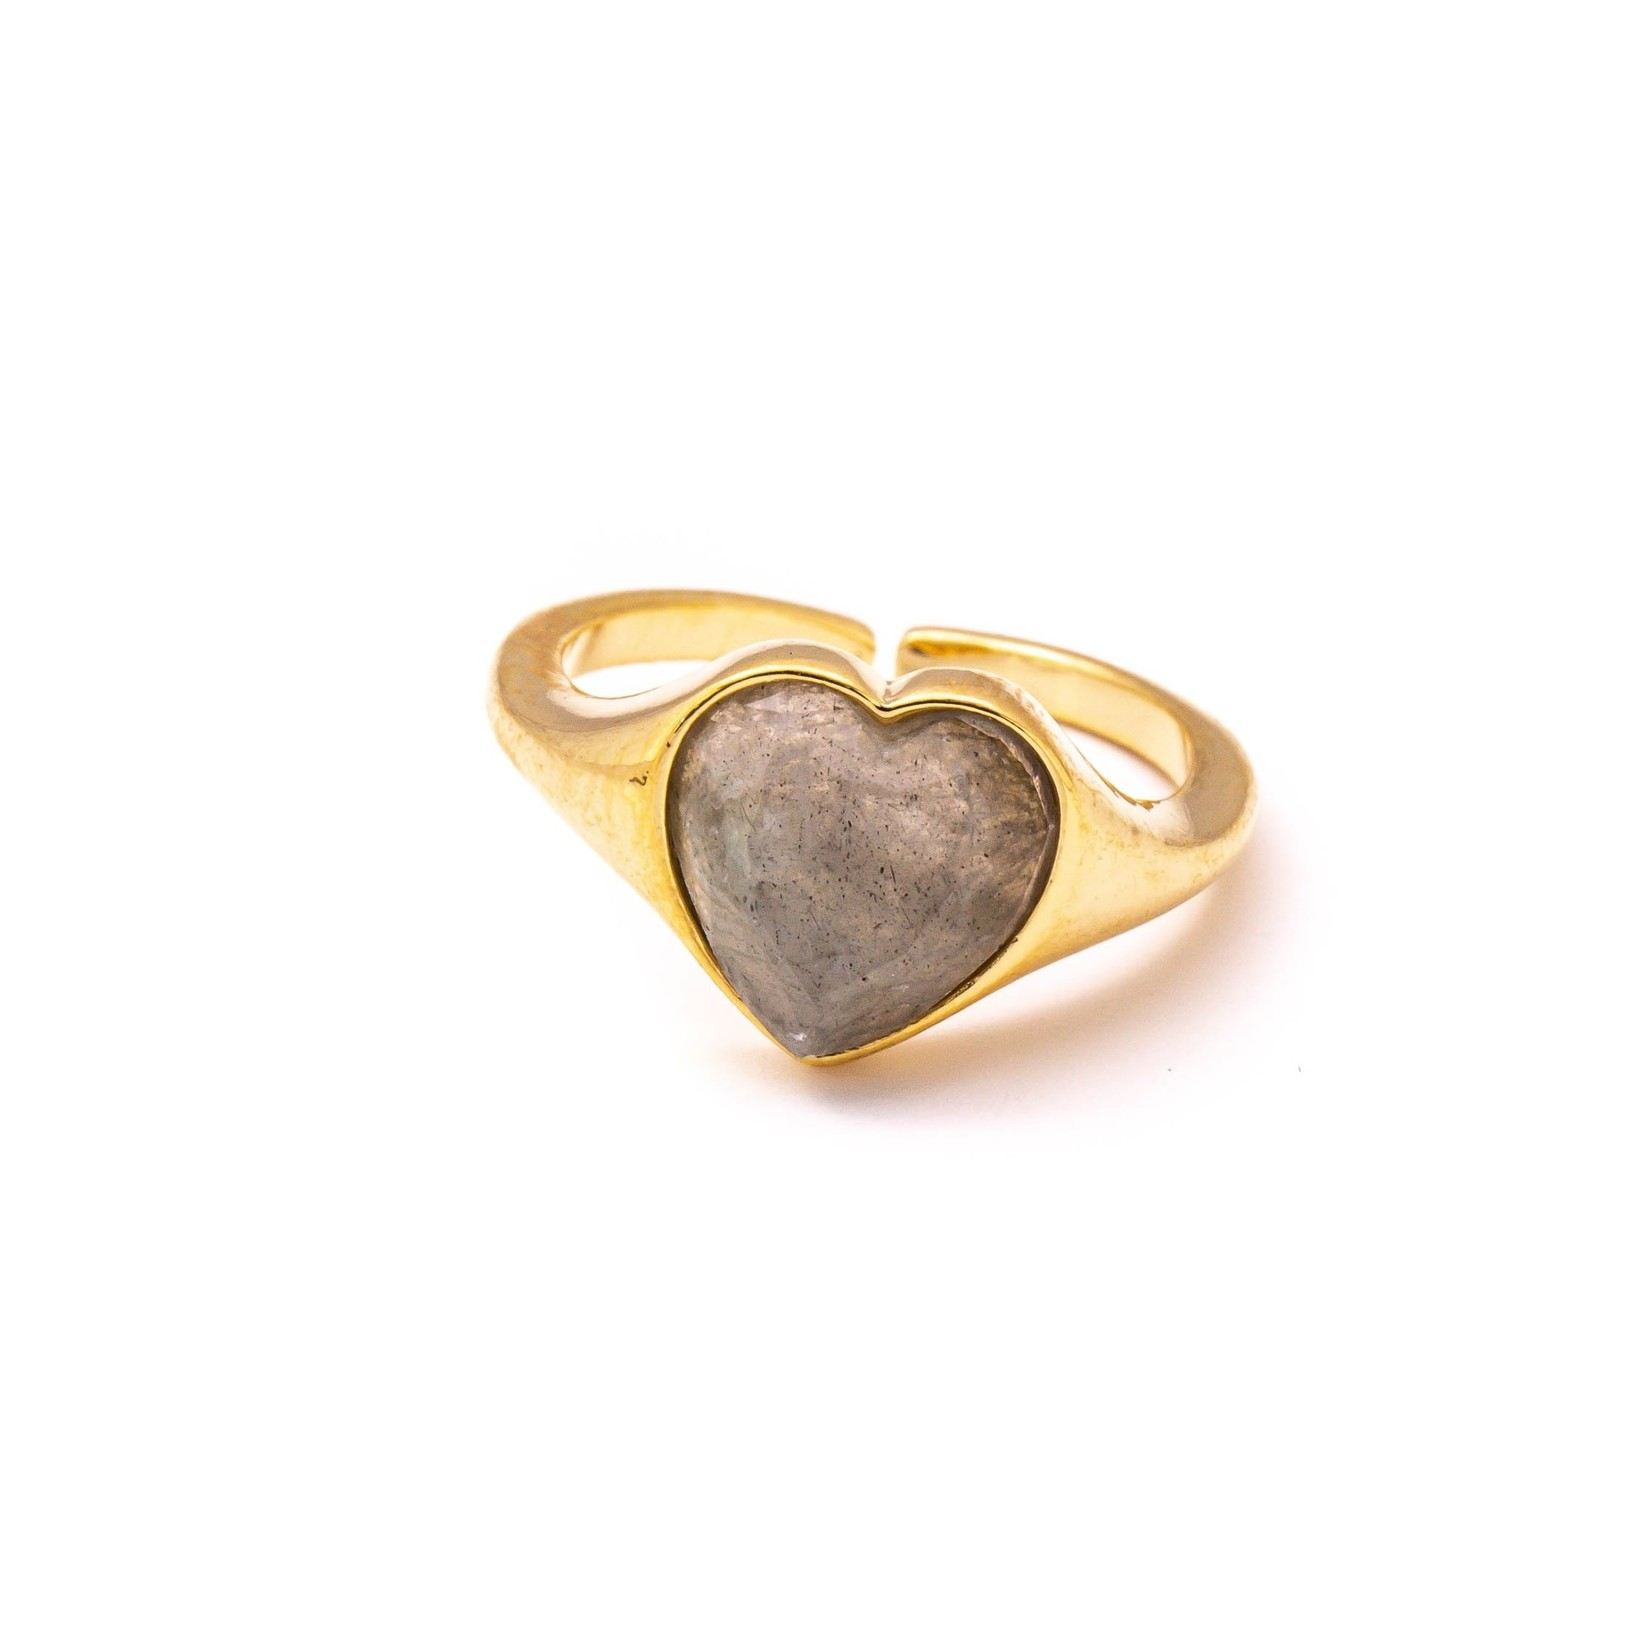 Anarchy Street Anarchy Street Heart Stone Charm Band Ring